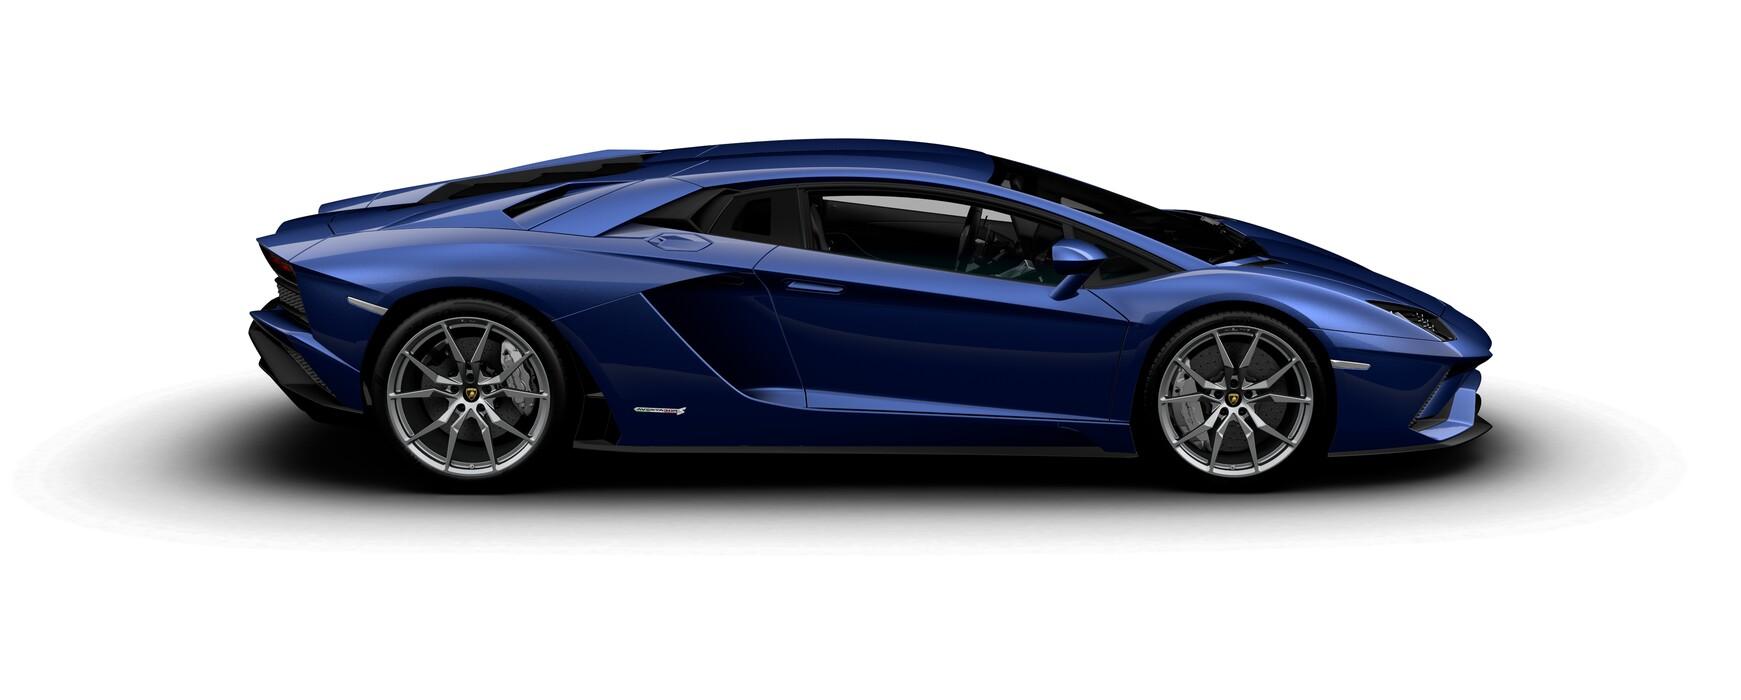 Lamborghini Aventador S Coupe metallic Blue Caelum side view